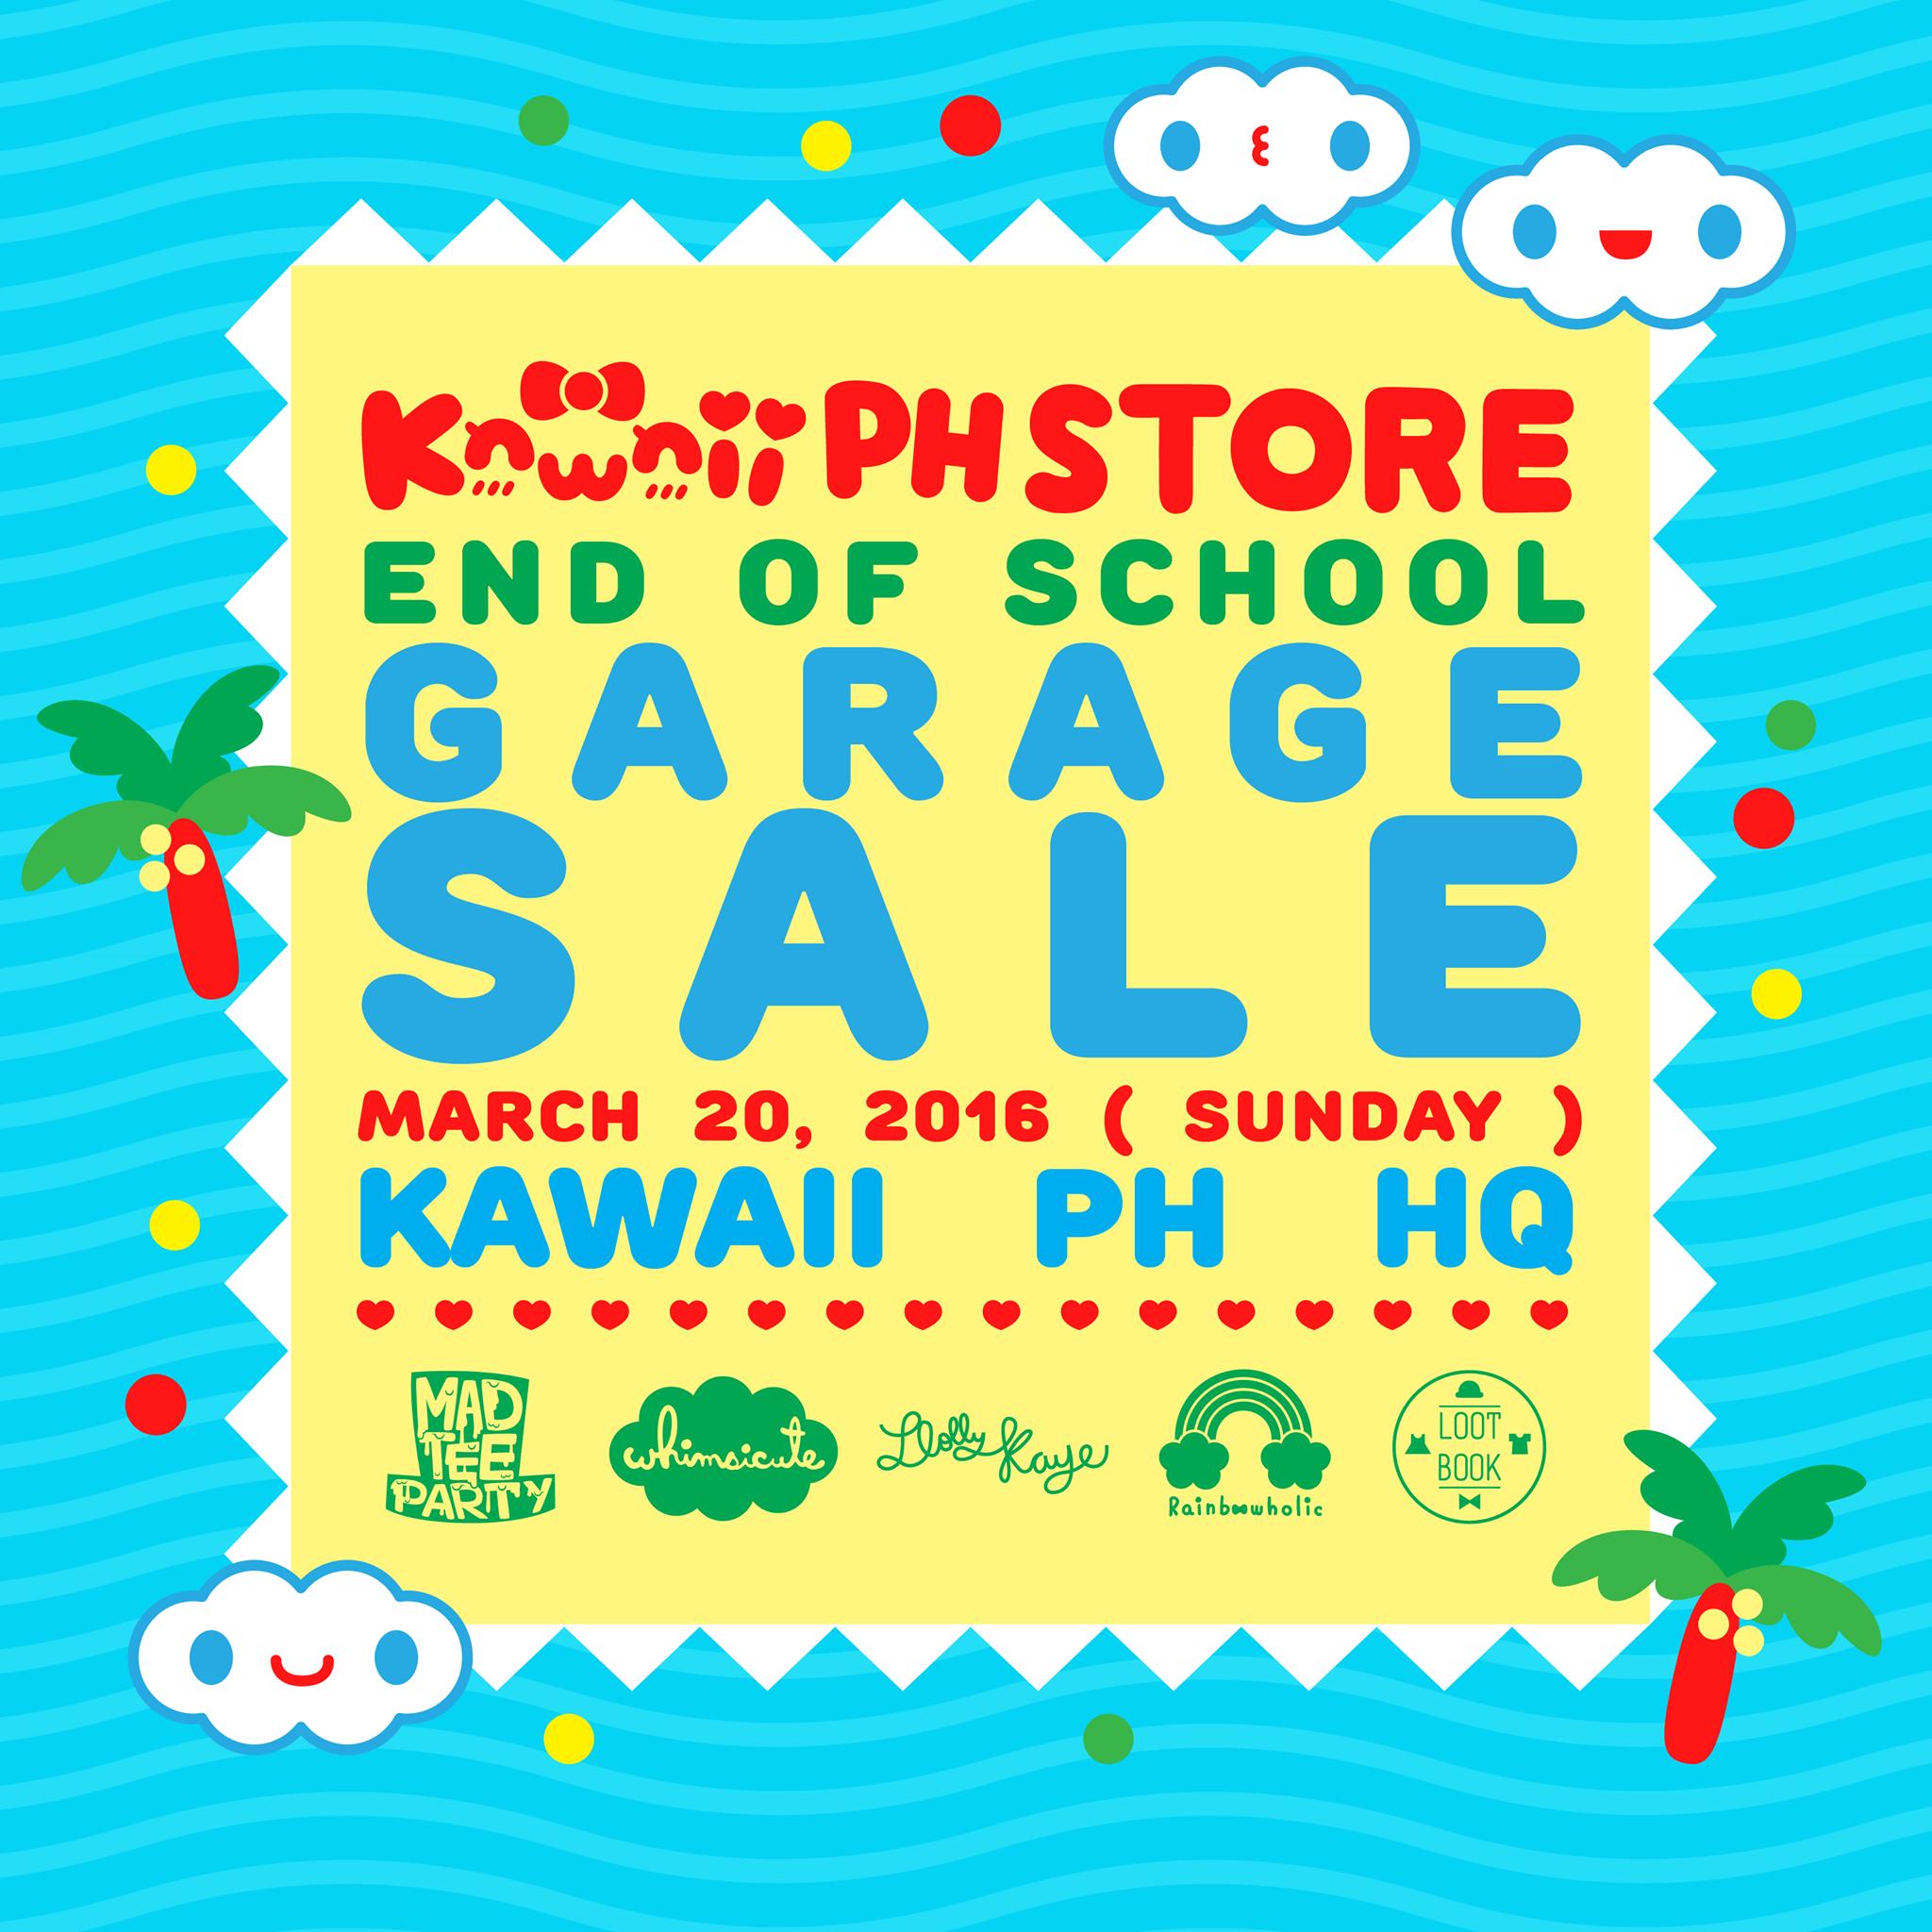 Kawaii PH Store Garage Sale